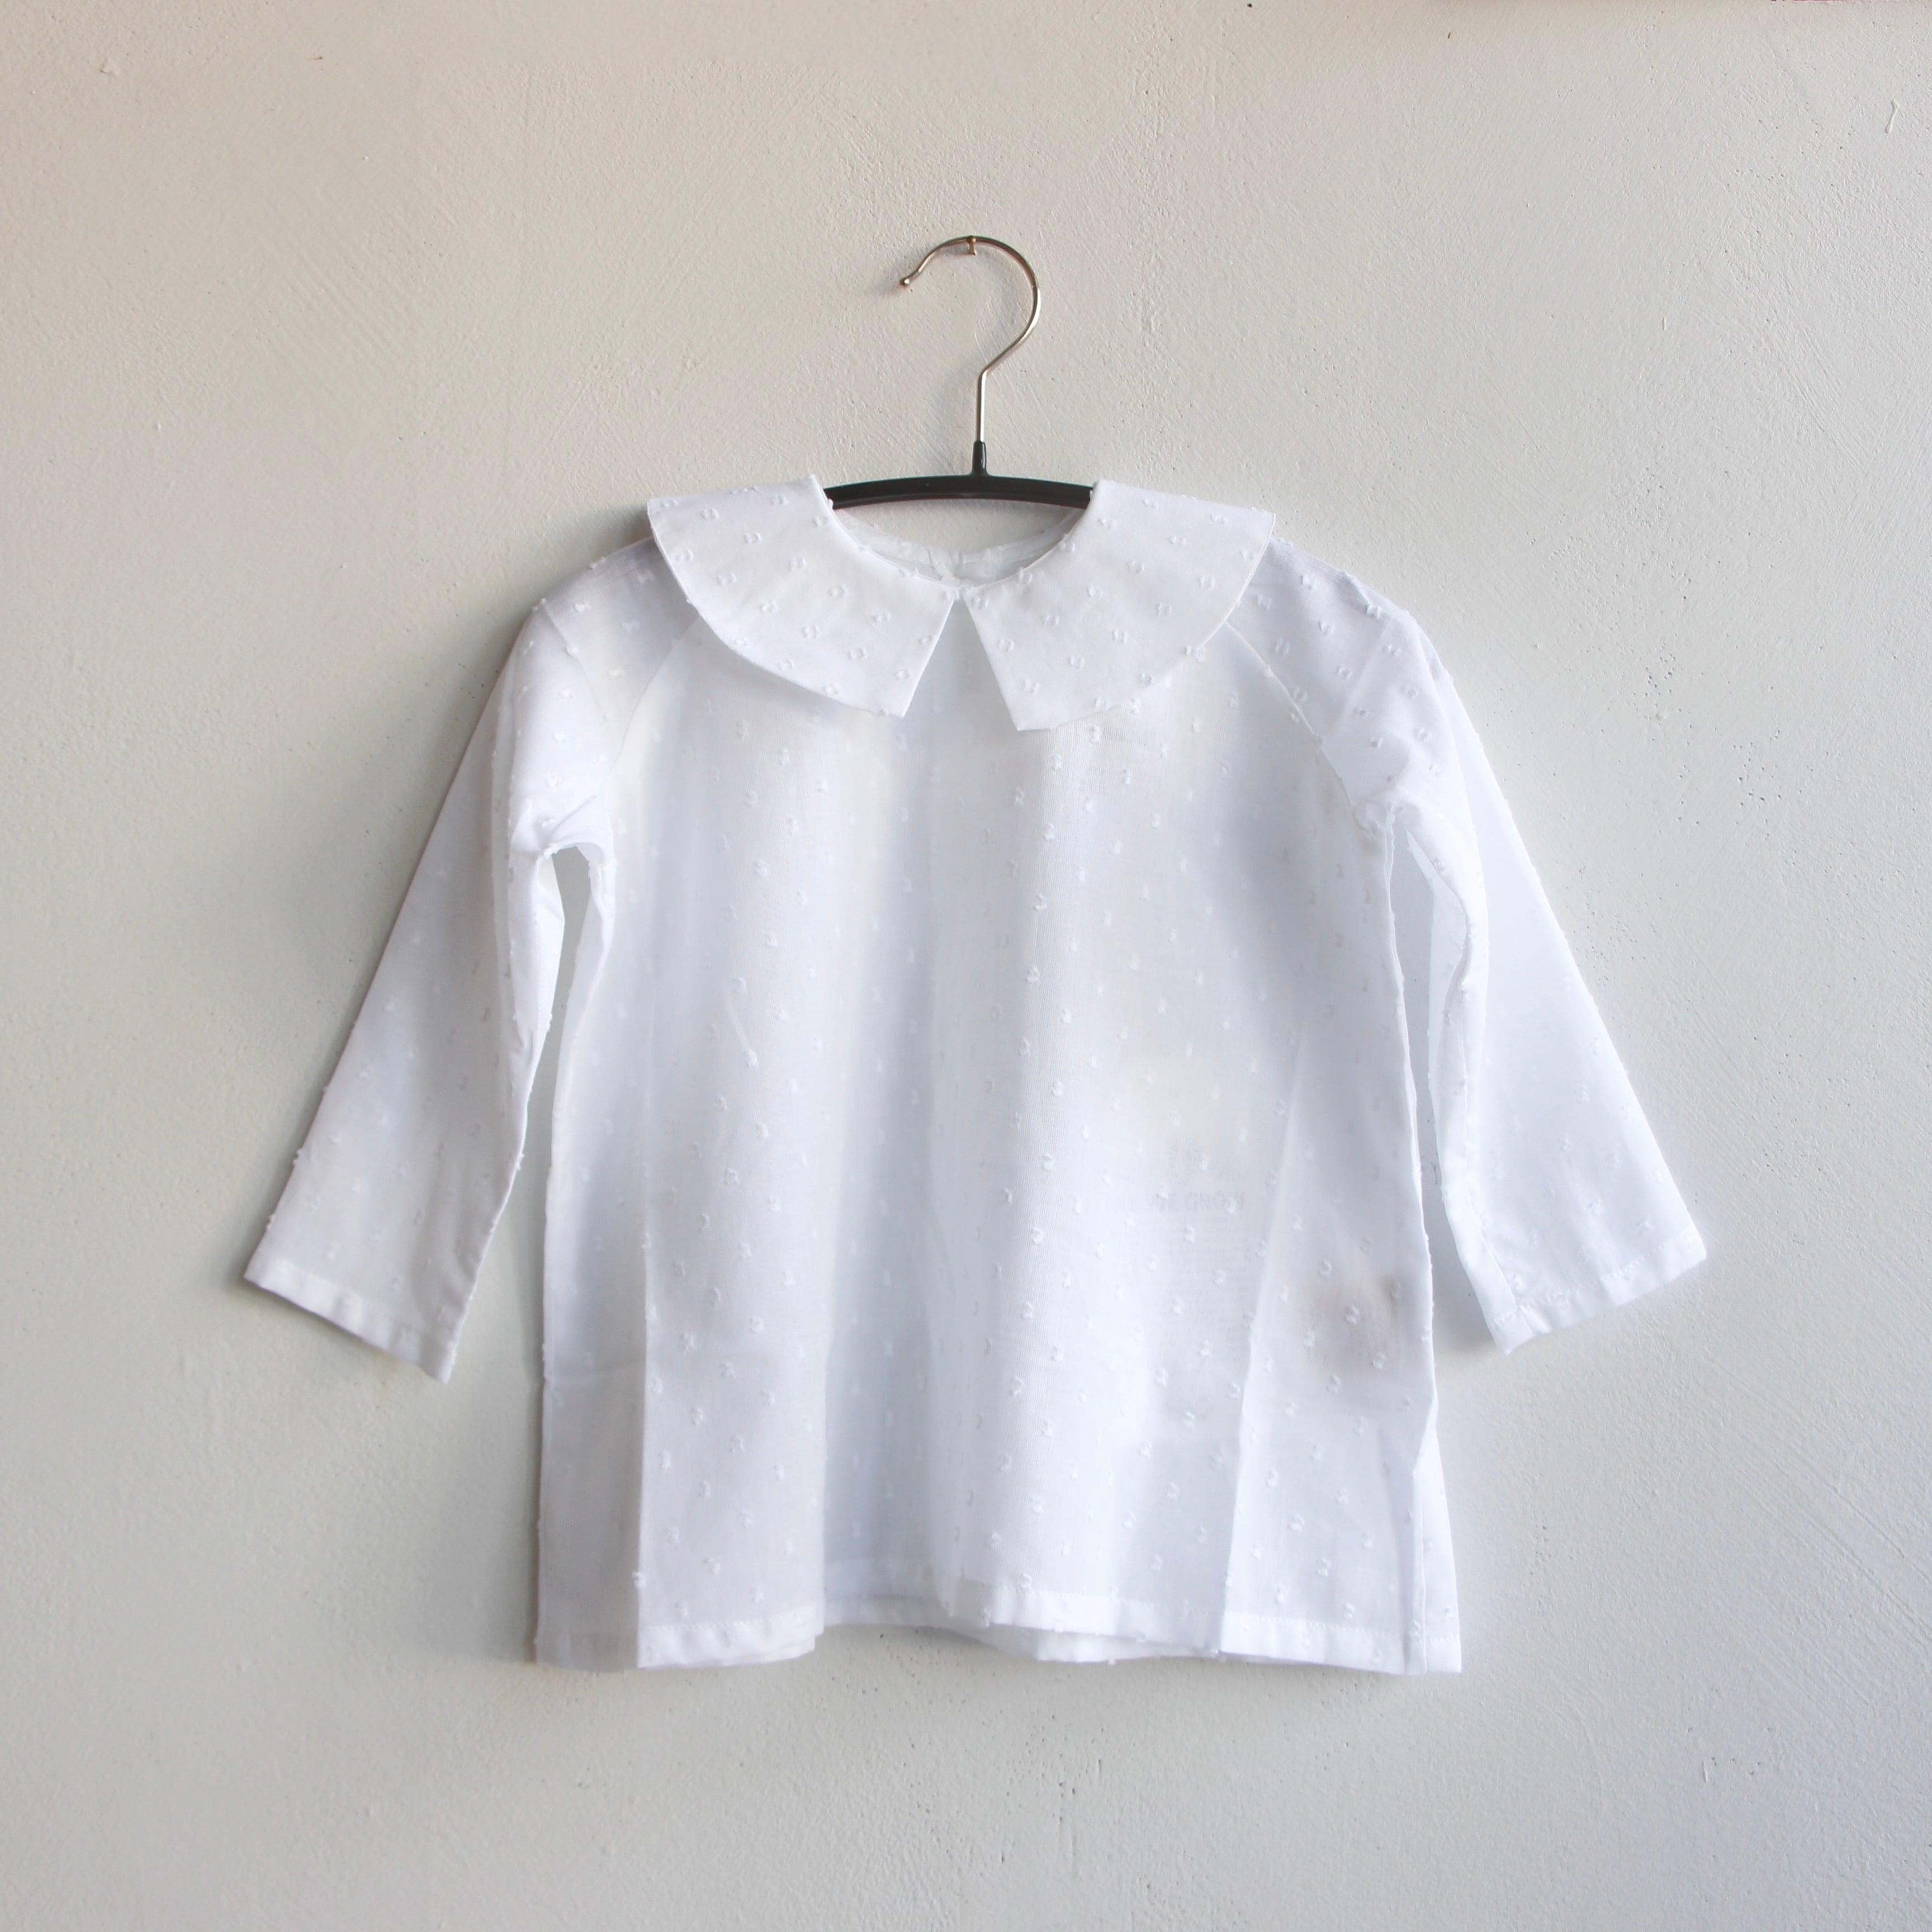 《AS WE GROW 2021AW》Arrow shirts / White Point D'Esprit